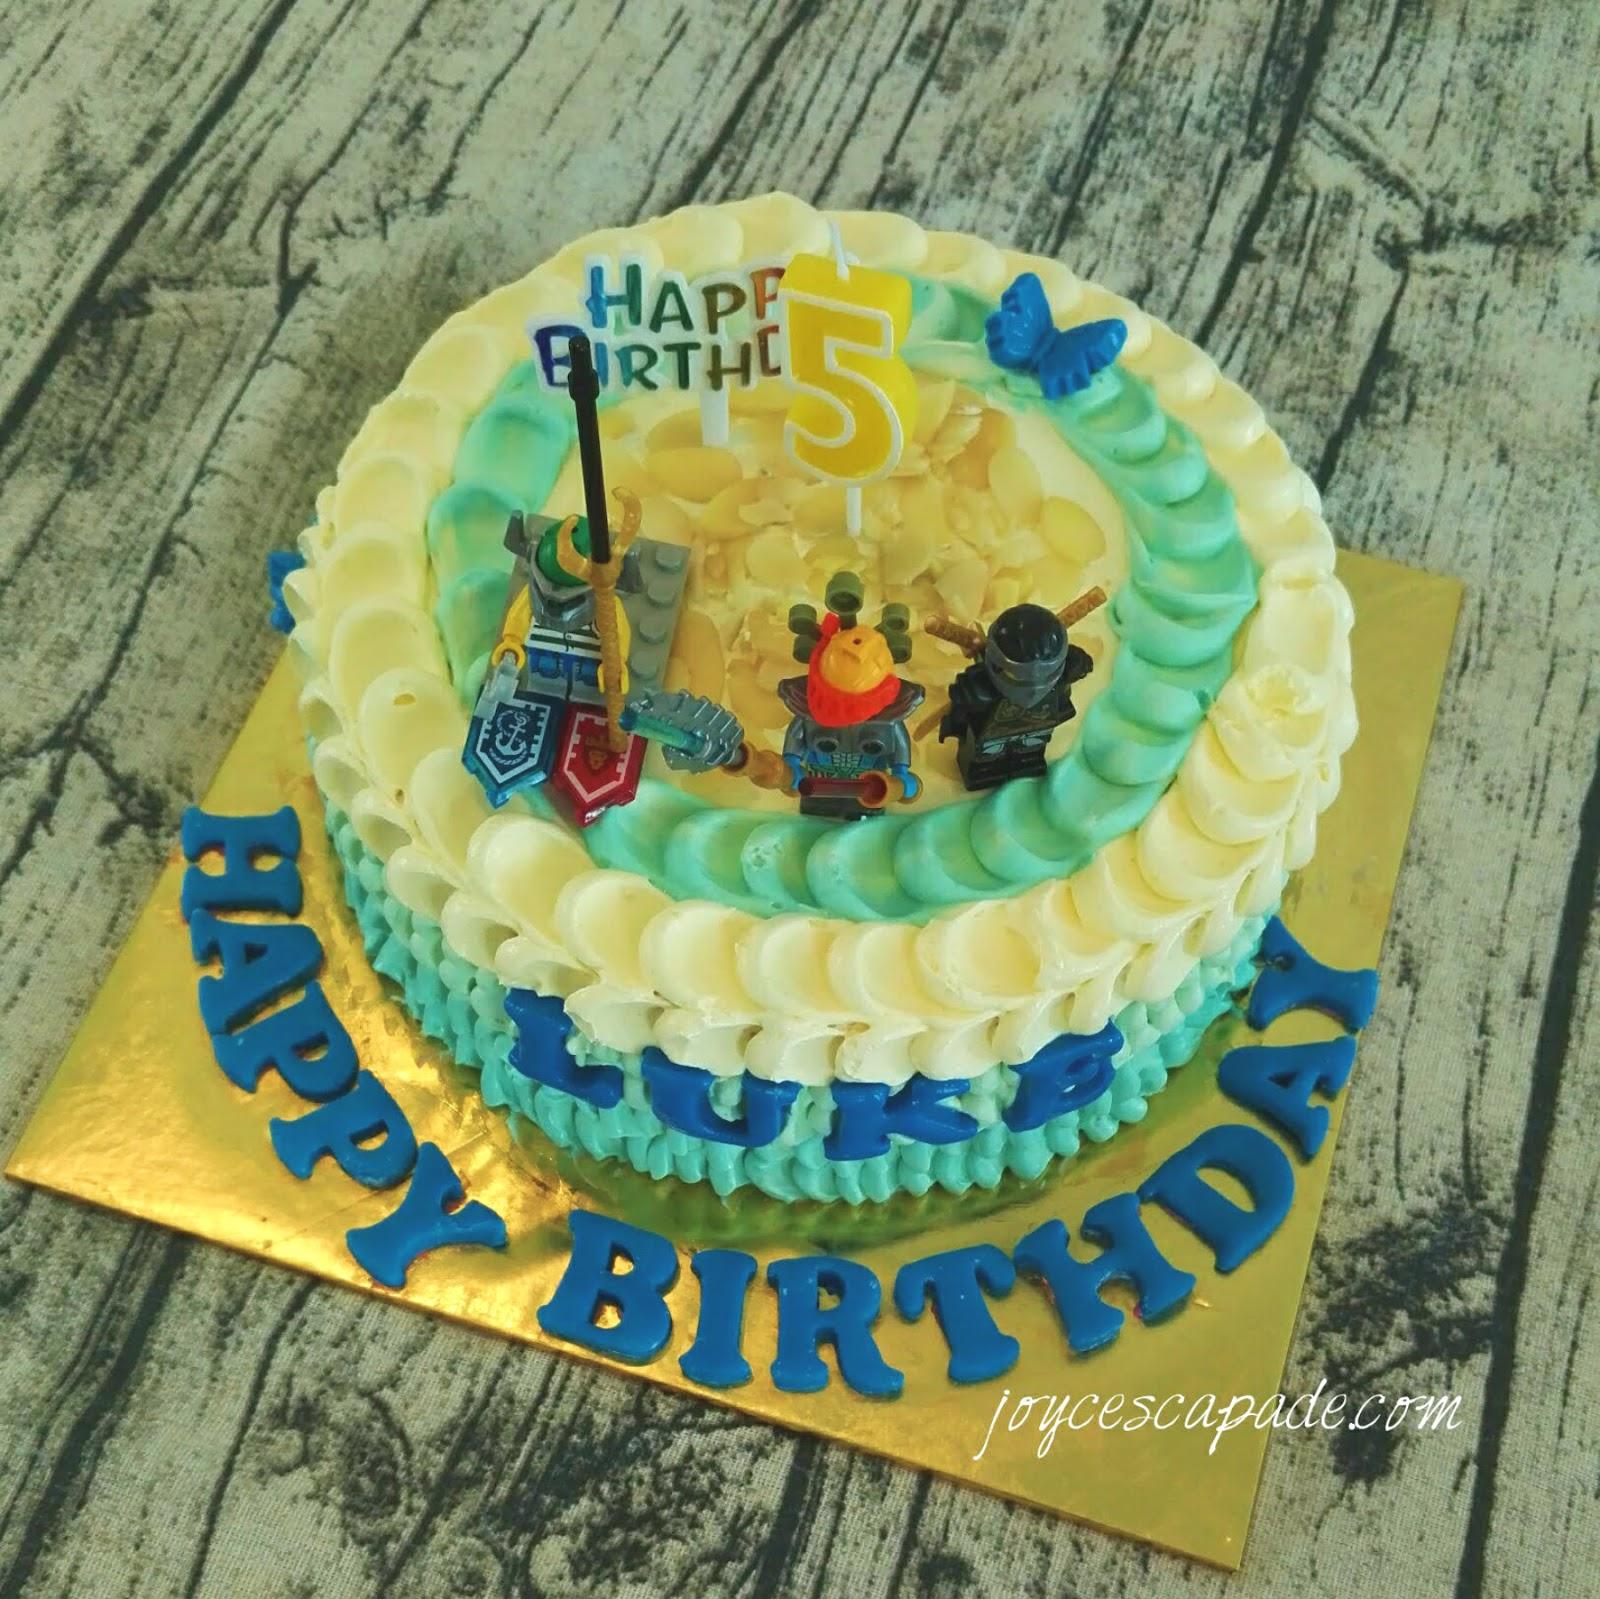 Fabulous My Boys Five Year Old Birthday Cake By Mommy Jasmine Joy N Funny Birthday Cards Online Chimdamsfinfo